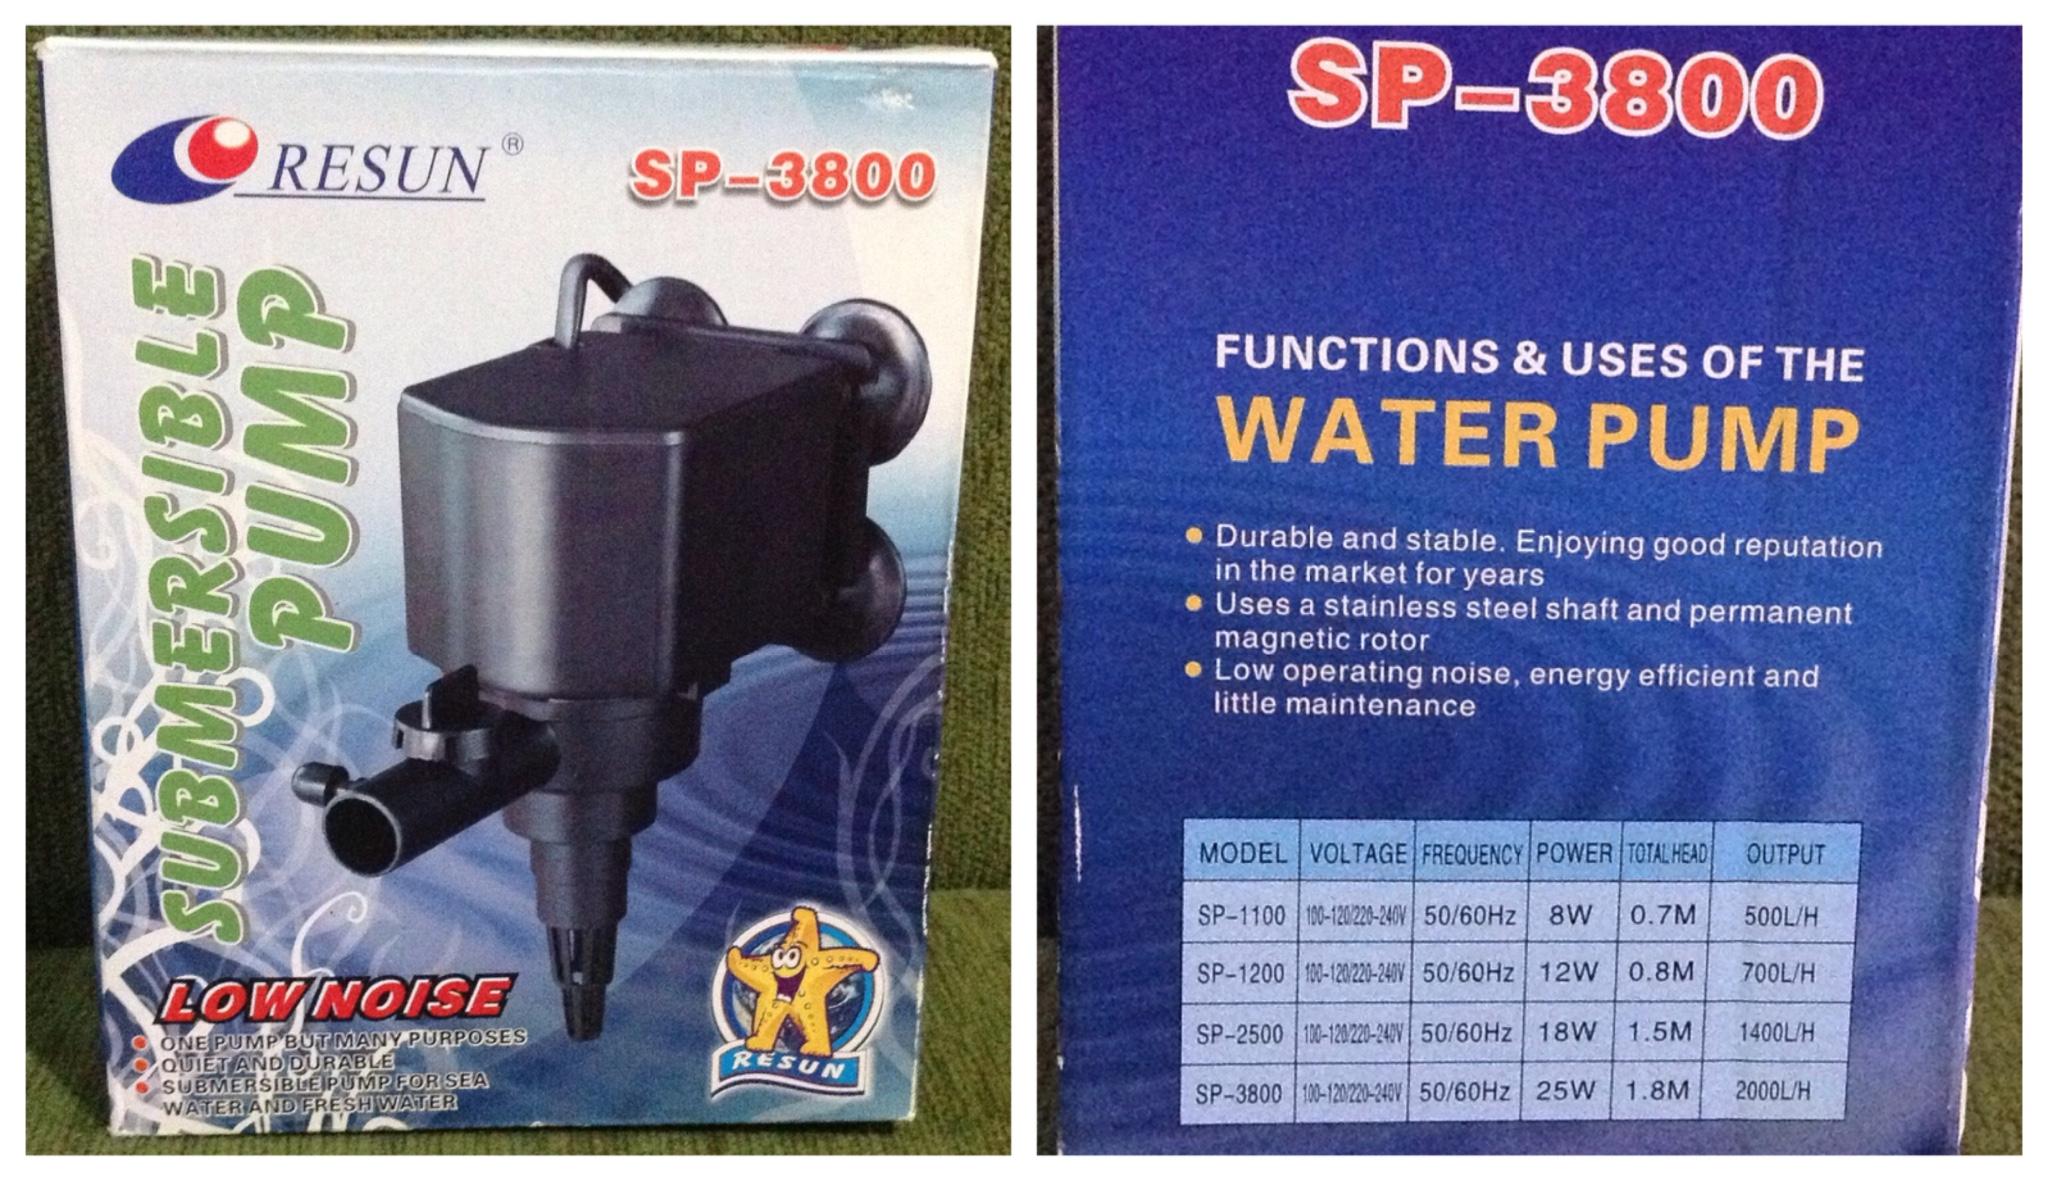 Jual Pompa Air Aquarium RESUN SP 3800, cocok untuk ...